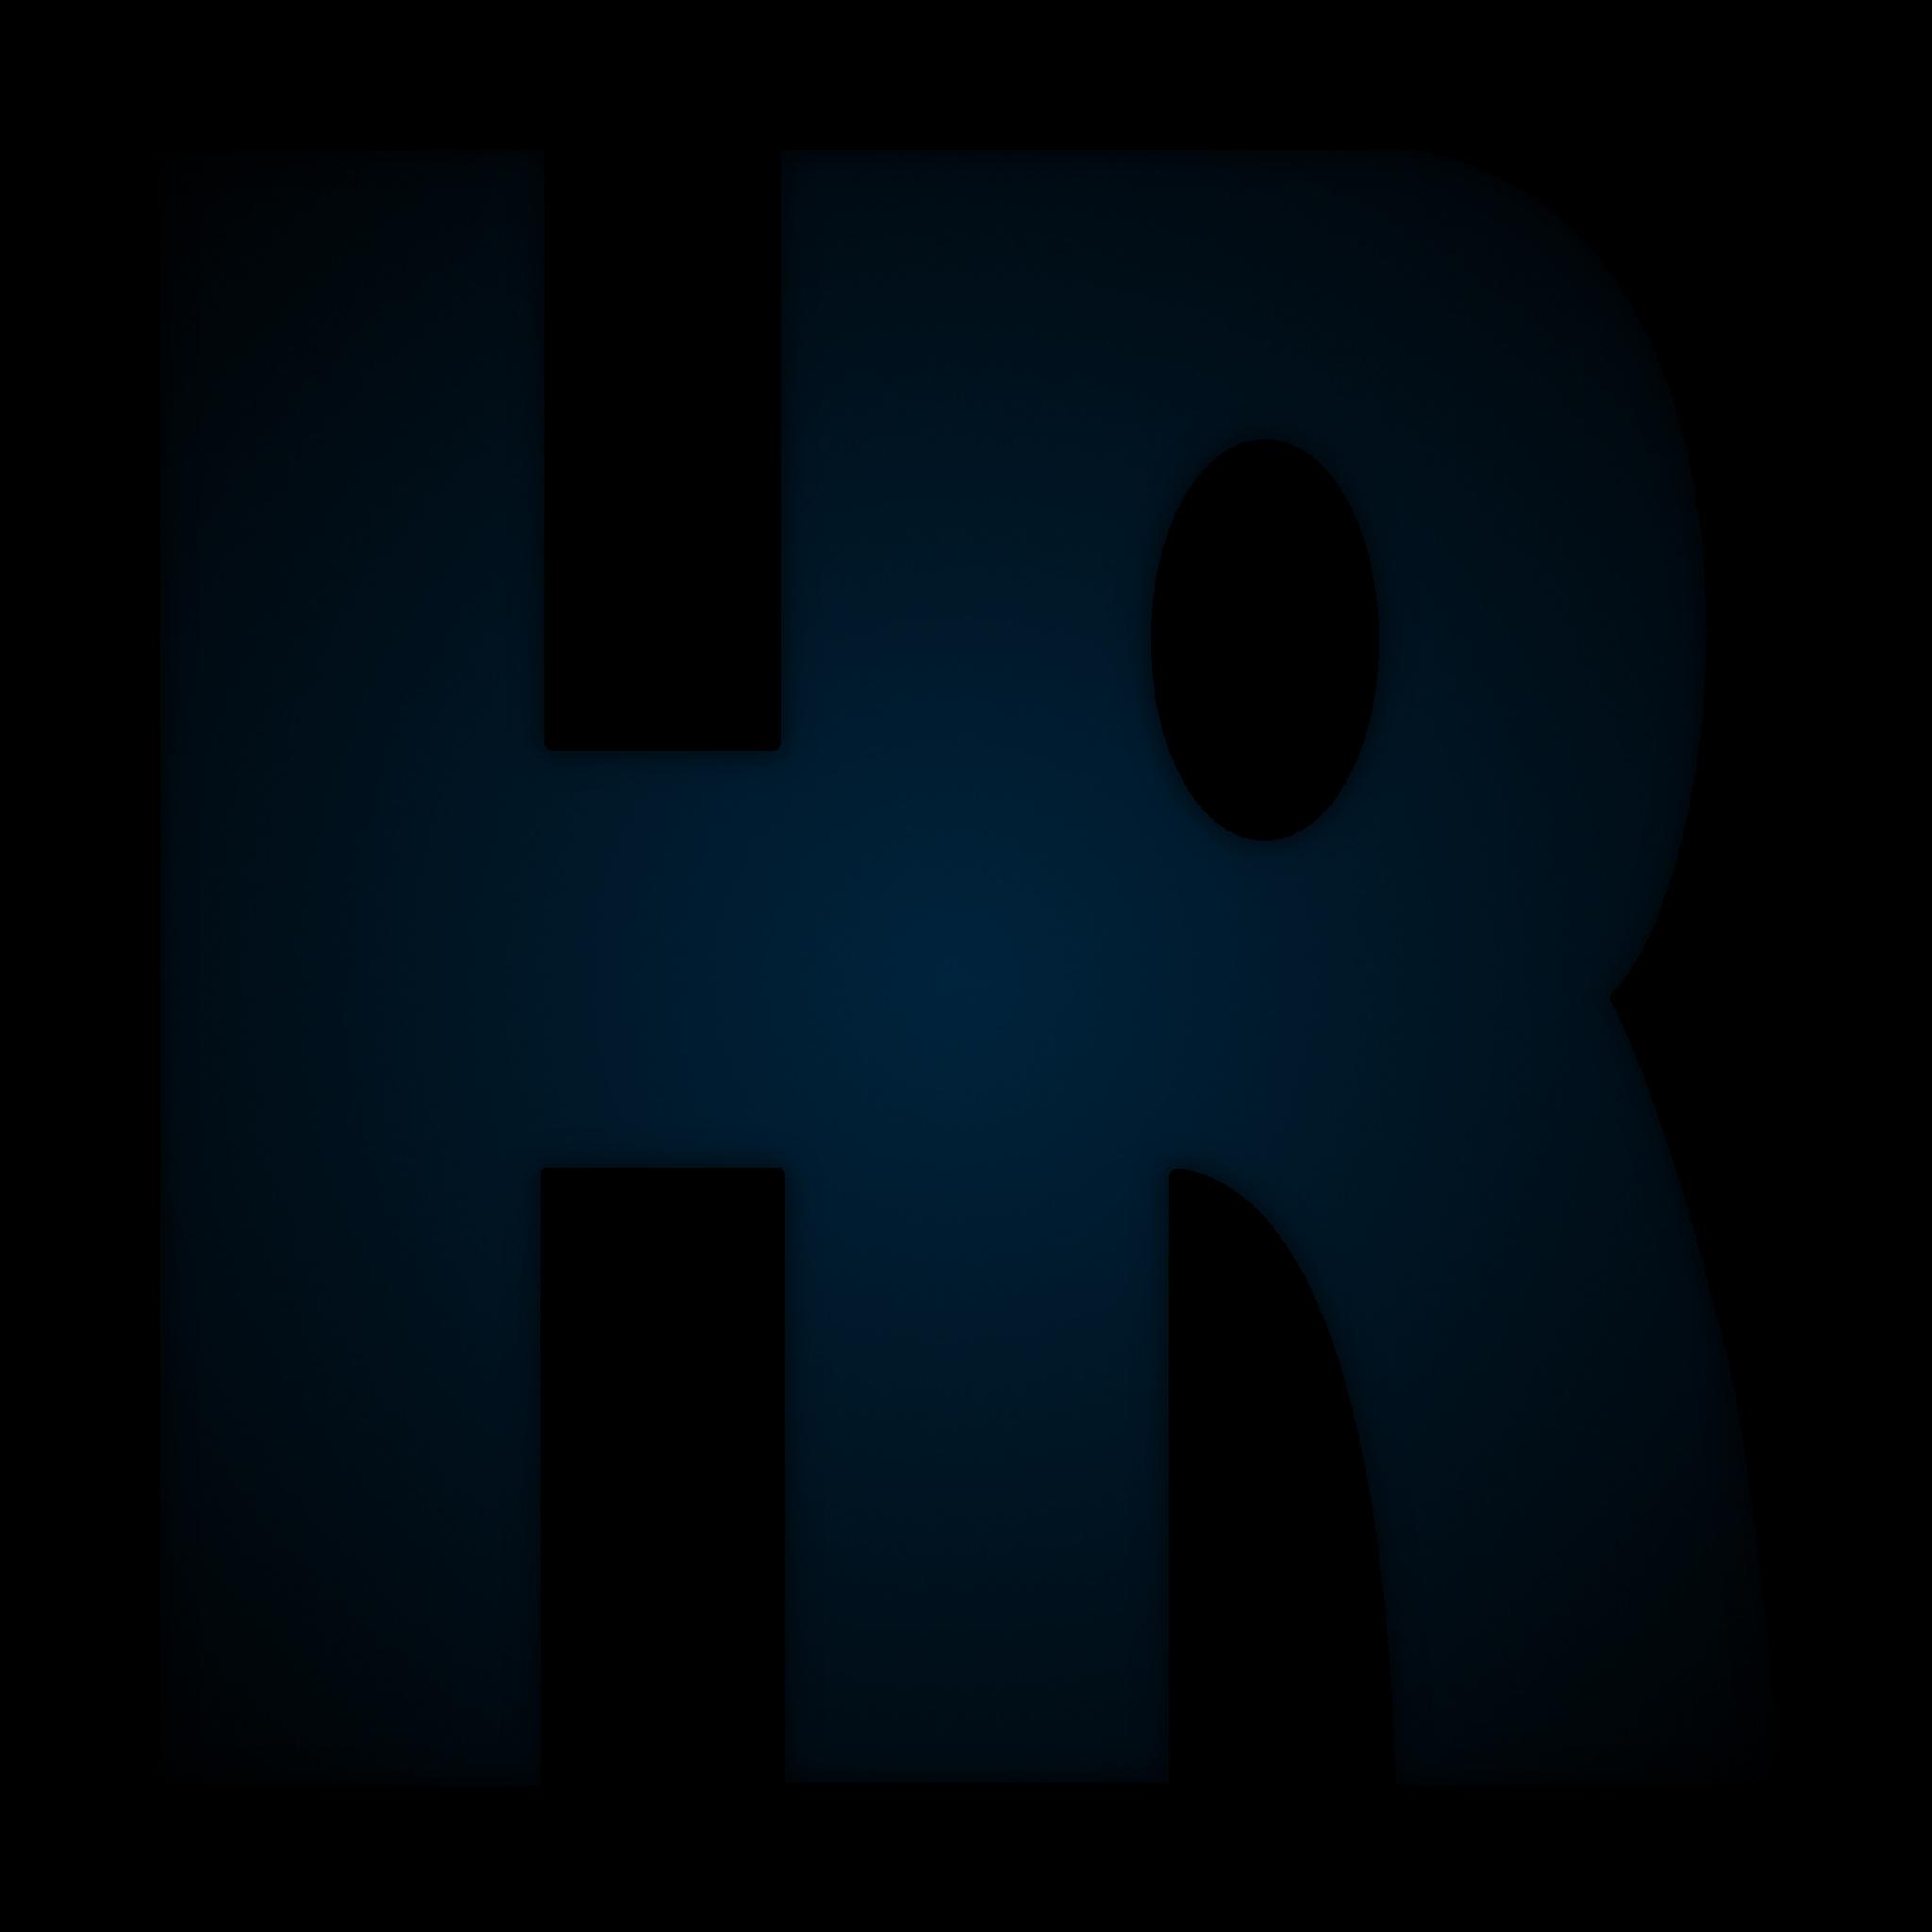 HardwareRat GmbH